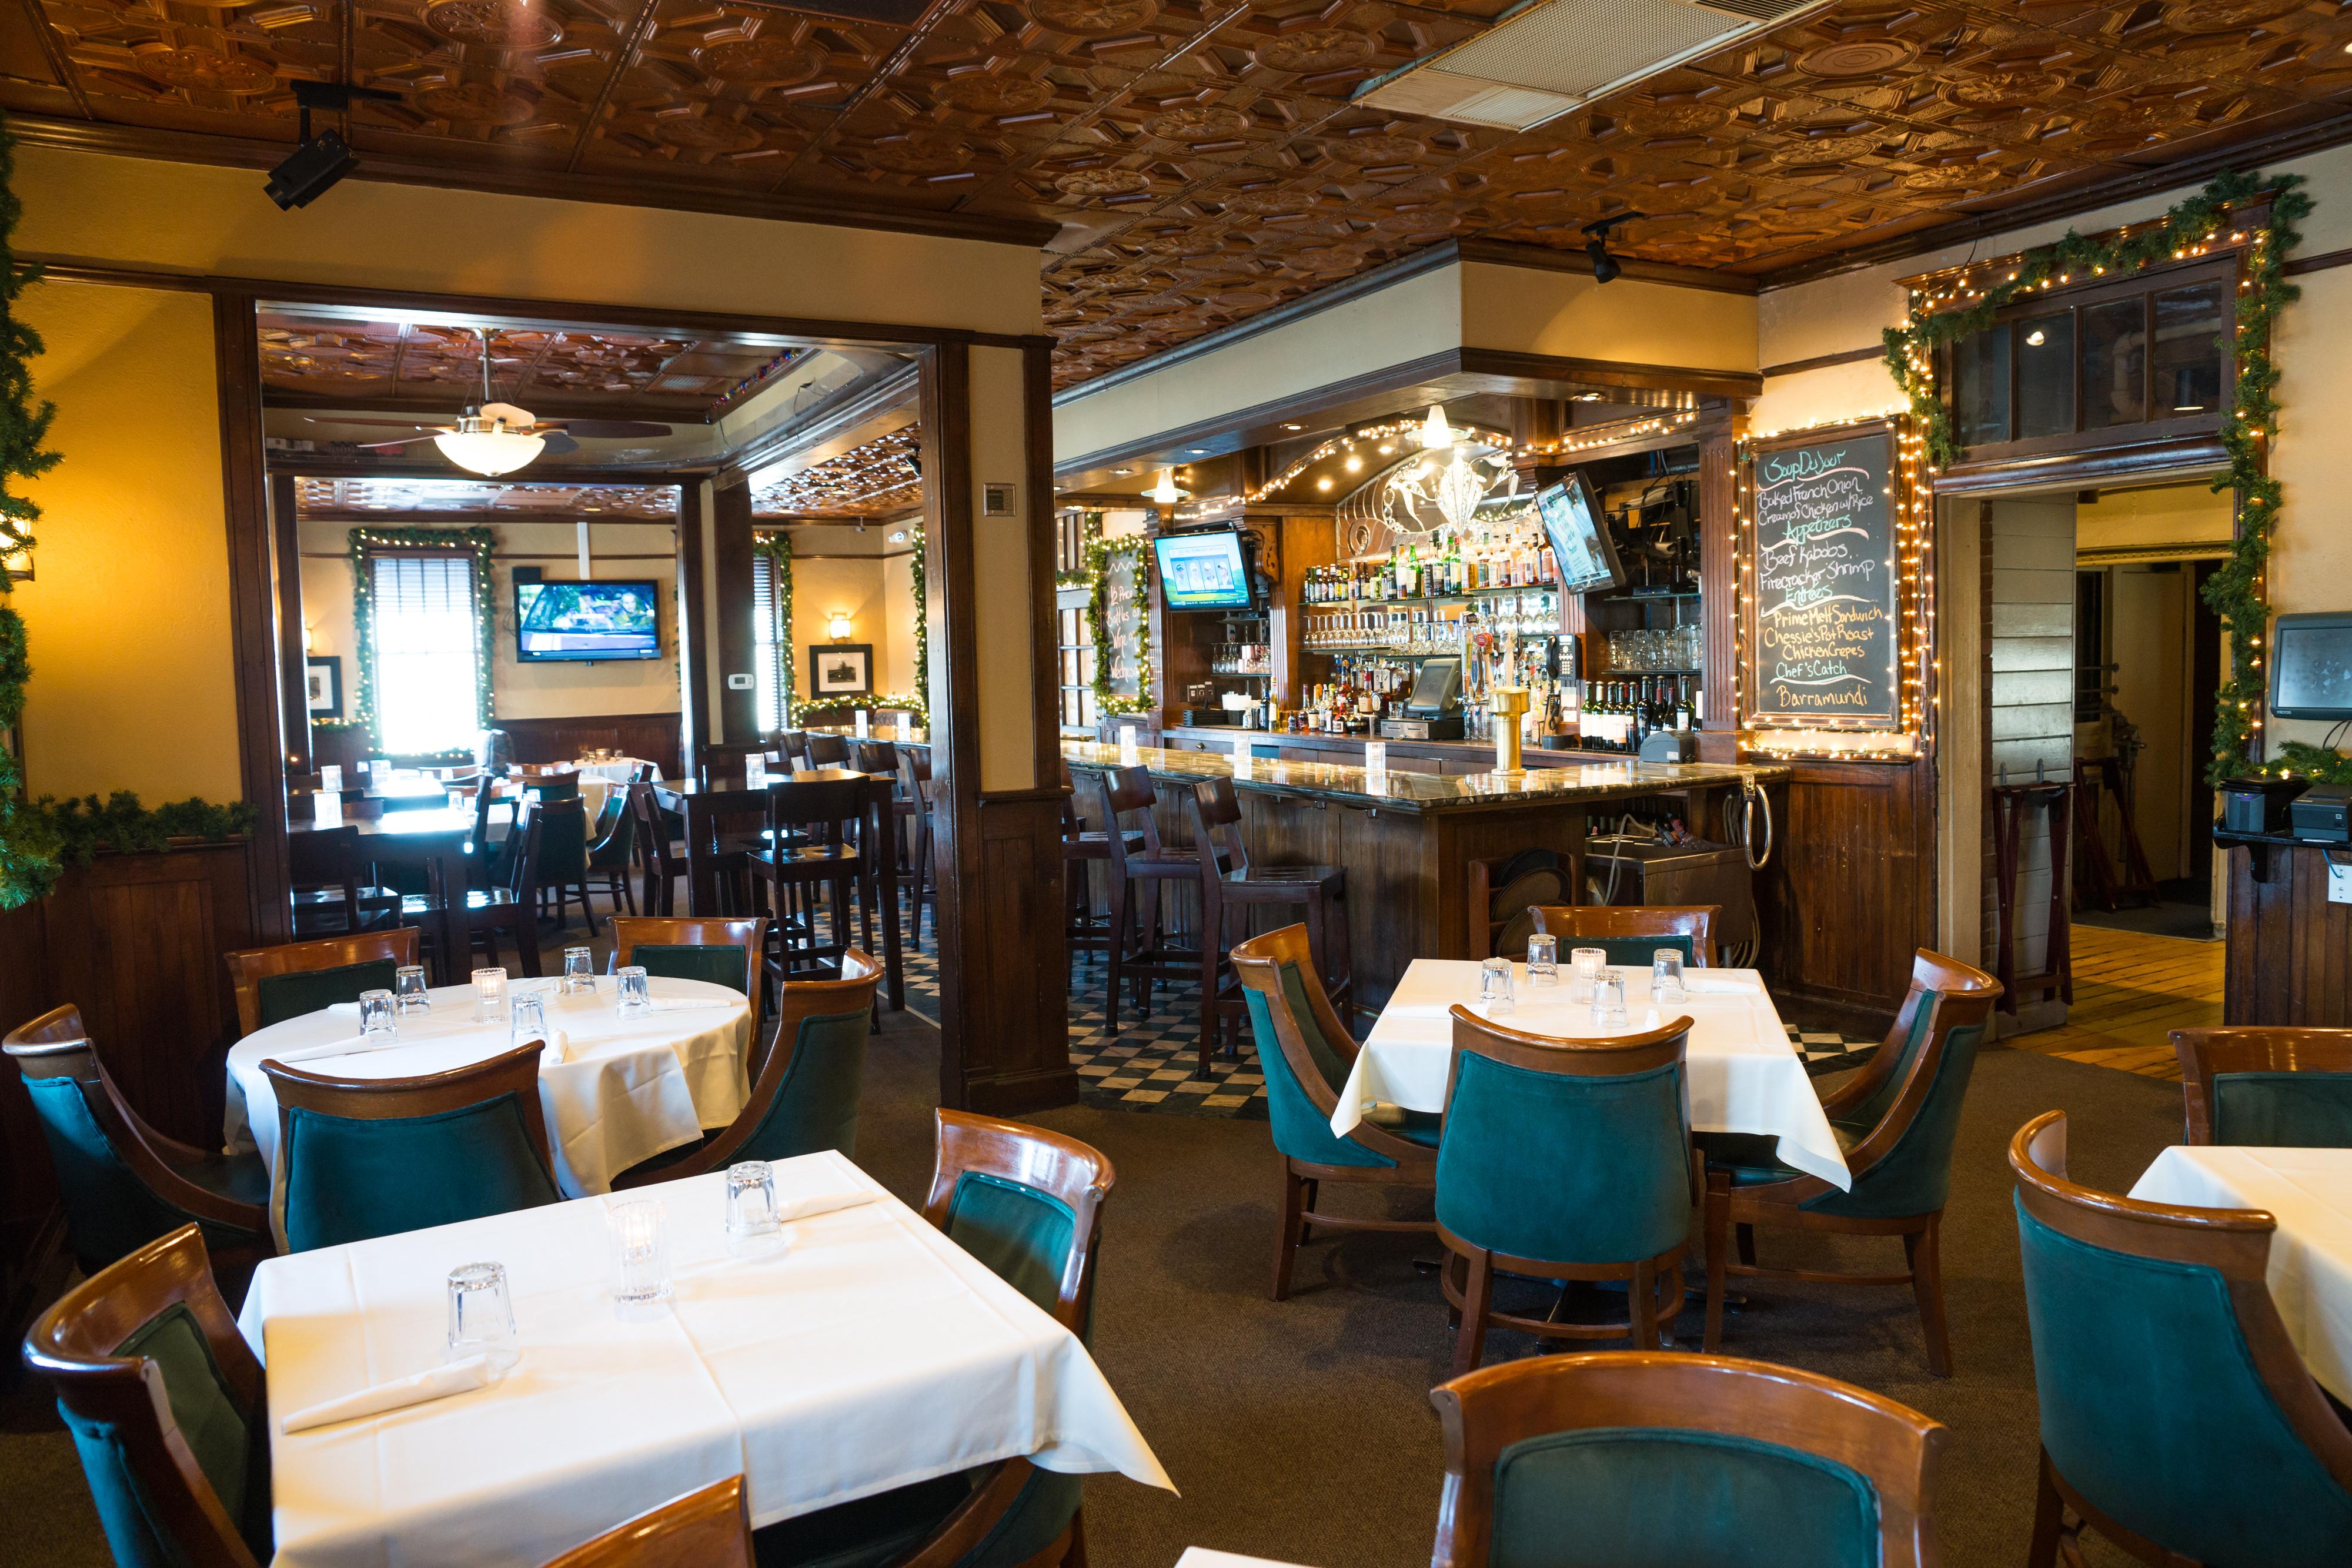 Chessie's Restaurant Pub Room